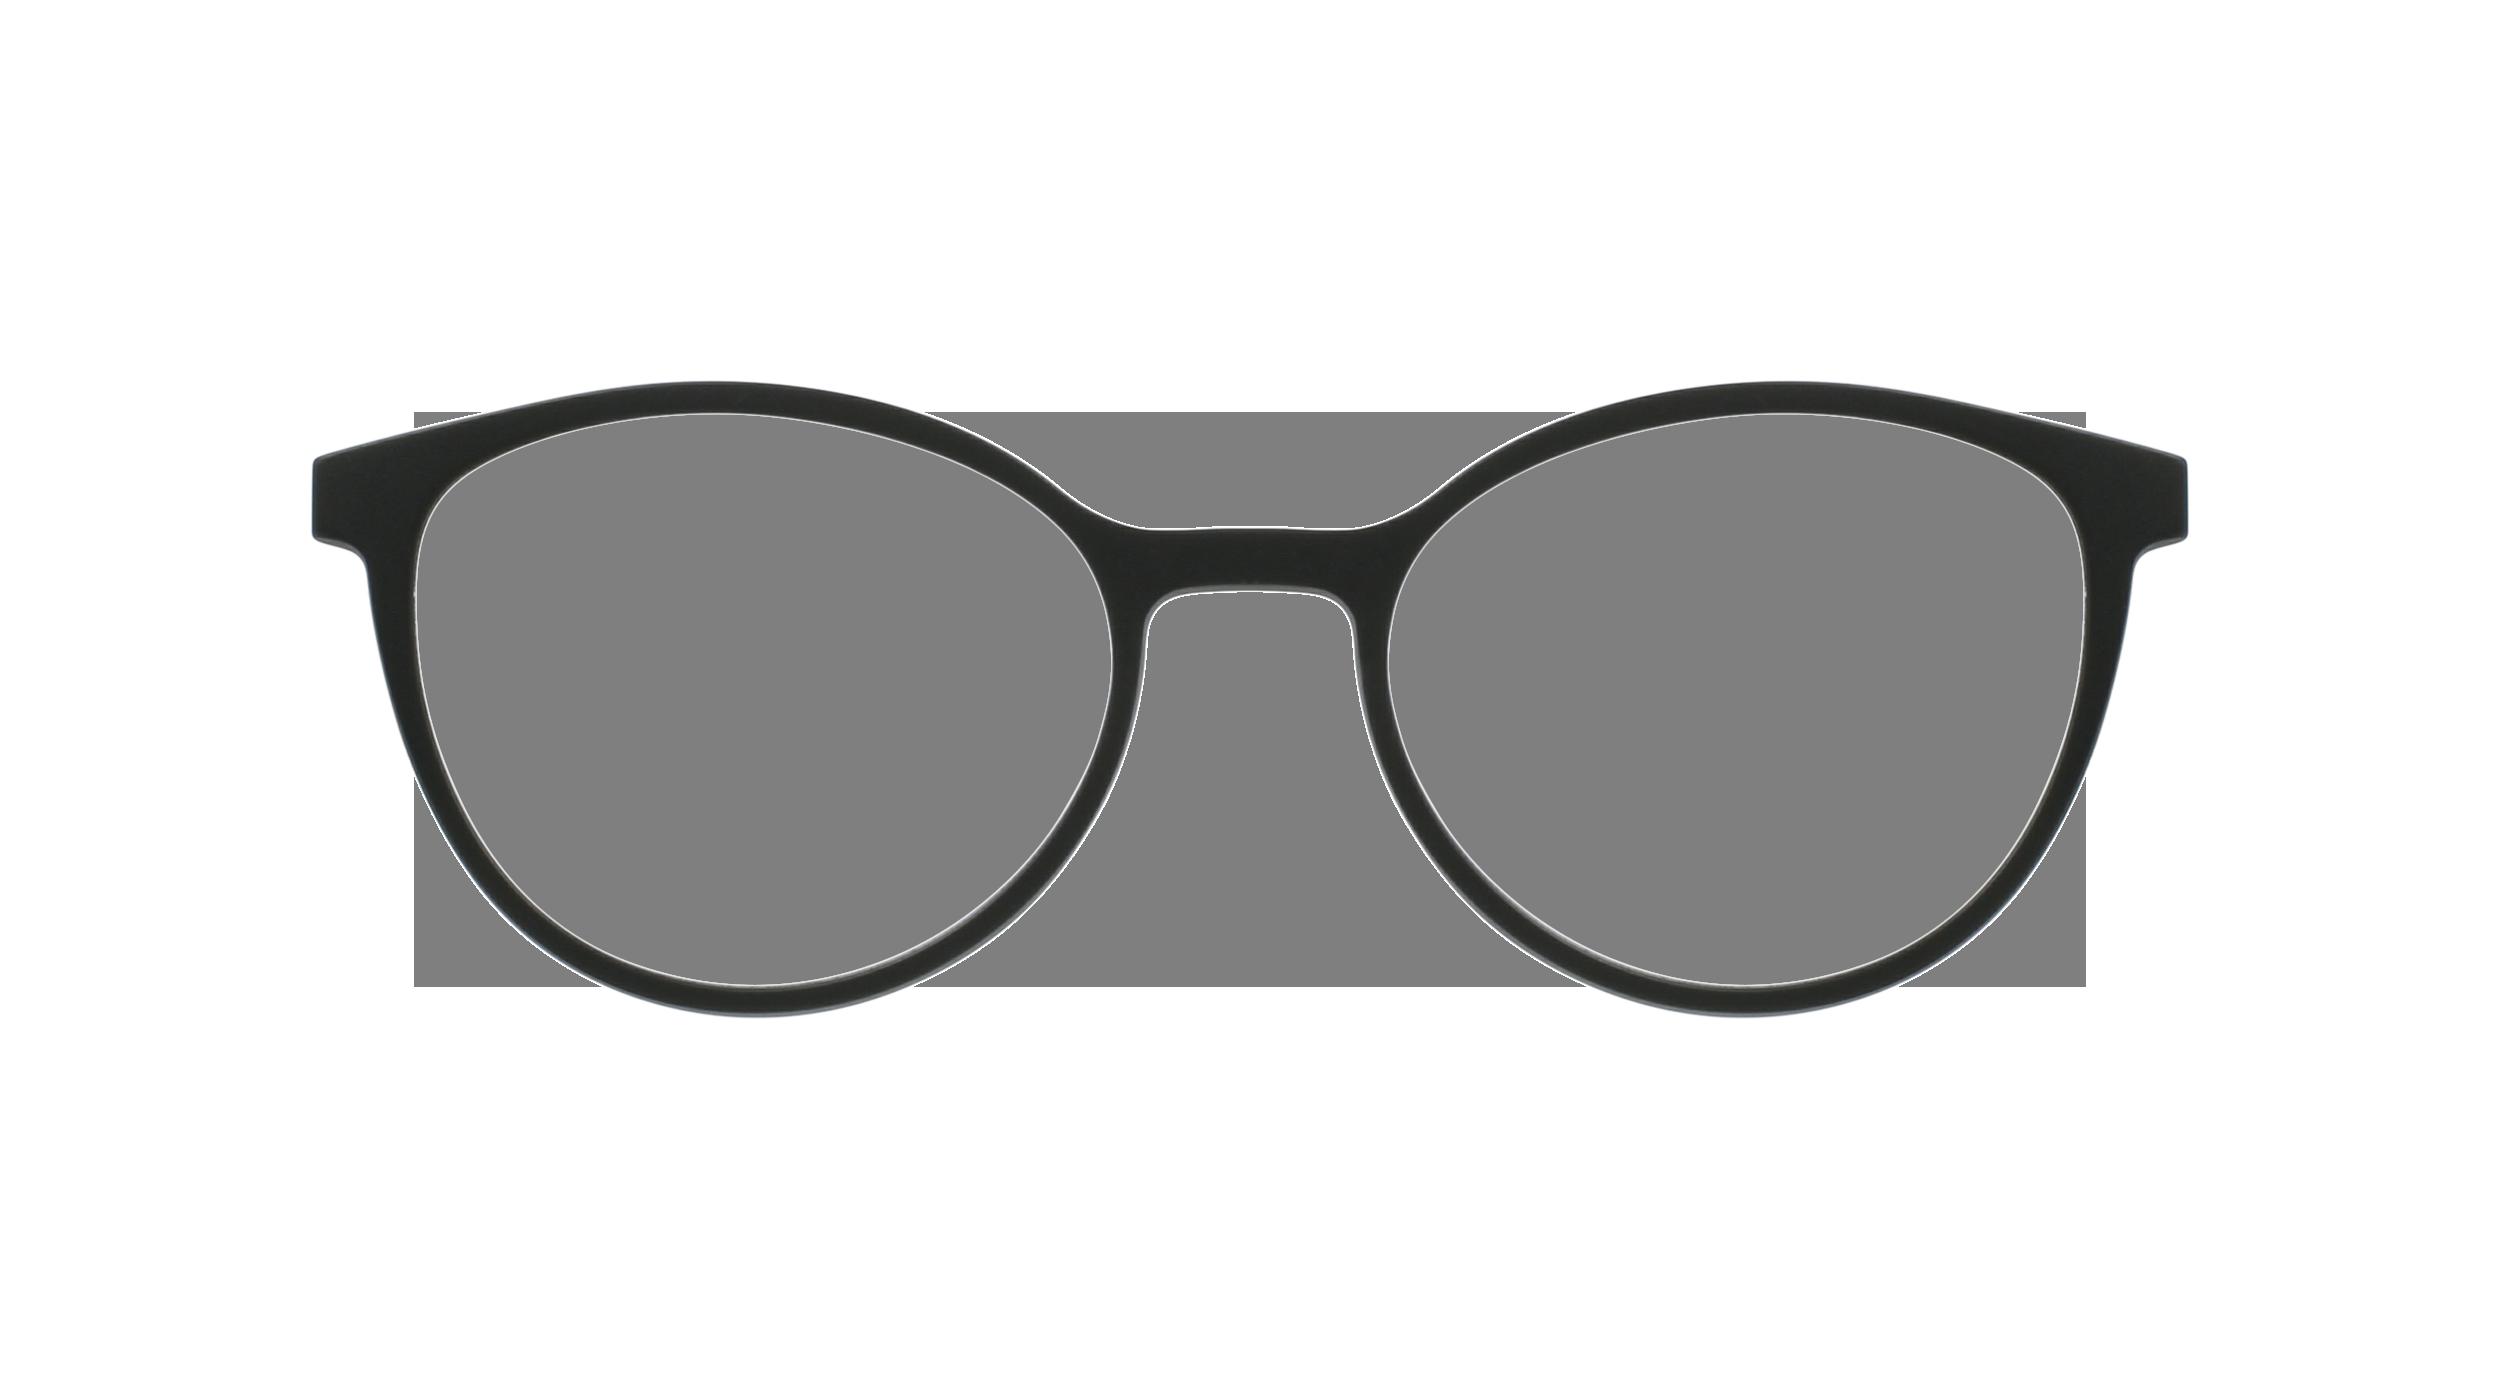 afflelou/france/products/smart_clip/clips_glasses/07630036458914.png